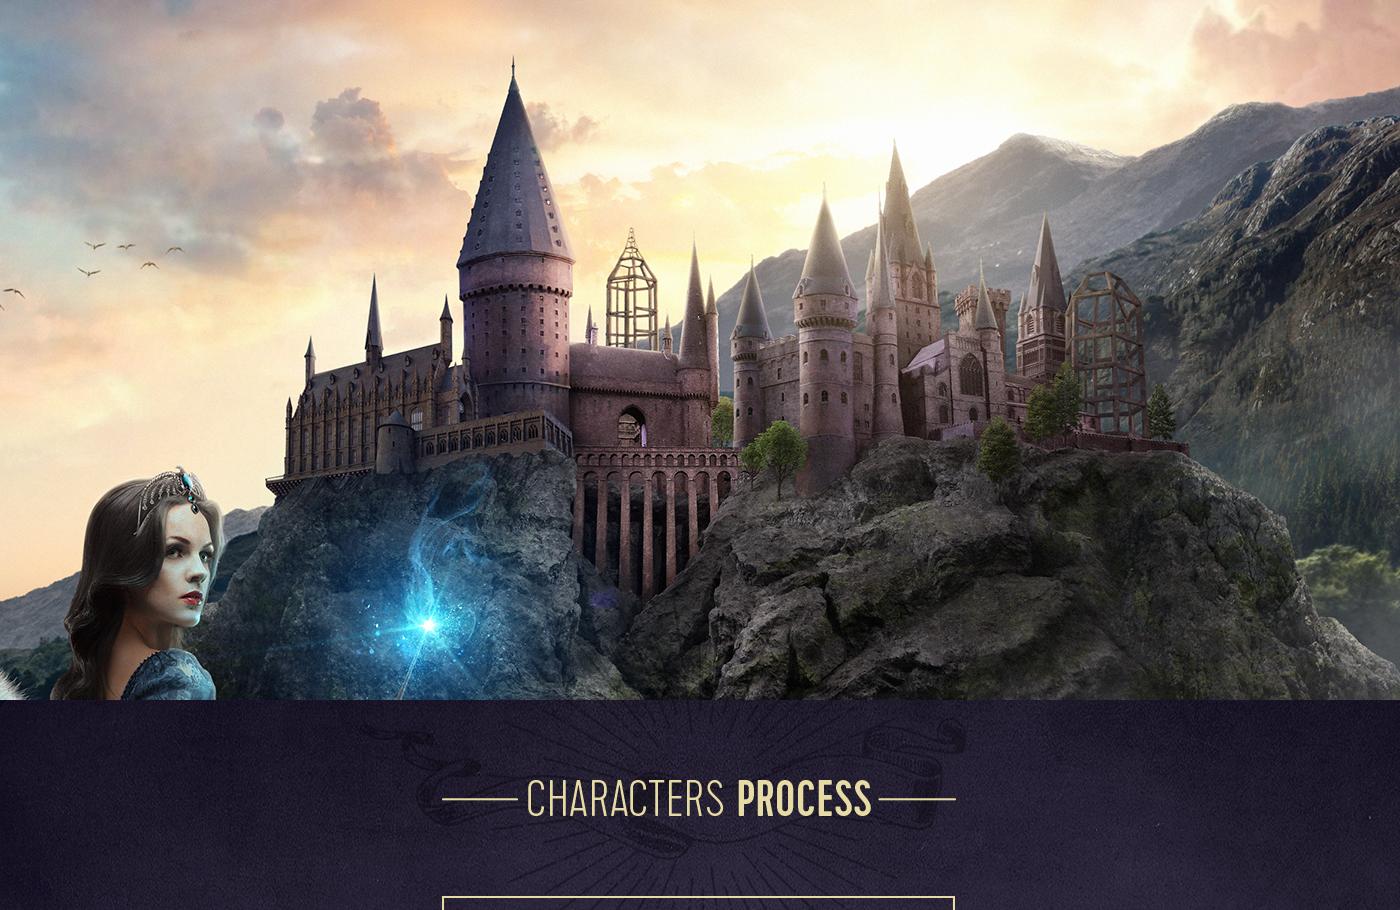 Helga Hufflepuff,Salazar Slytherin,Rowena Ravenclaw,Godric Gryffindor,harry potter,Hogwarts,J.K. Rowling,Matte Painting,Magic  ,Founders